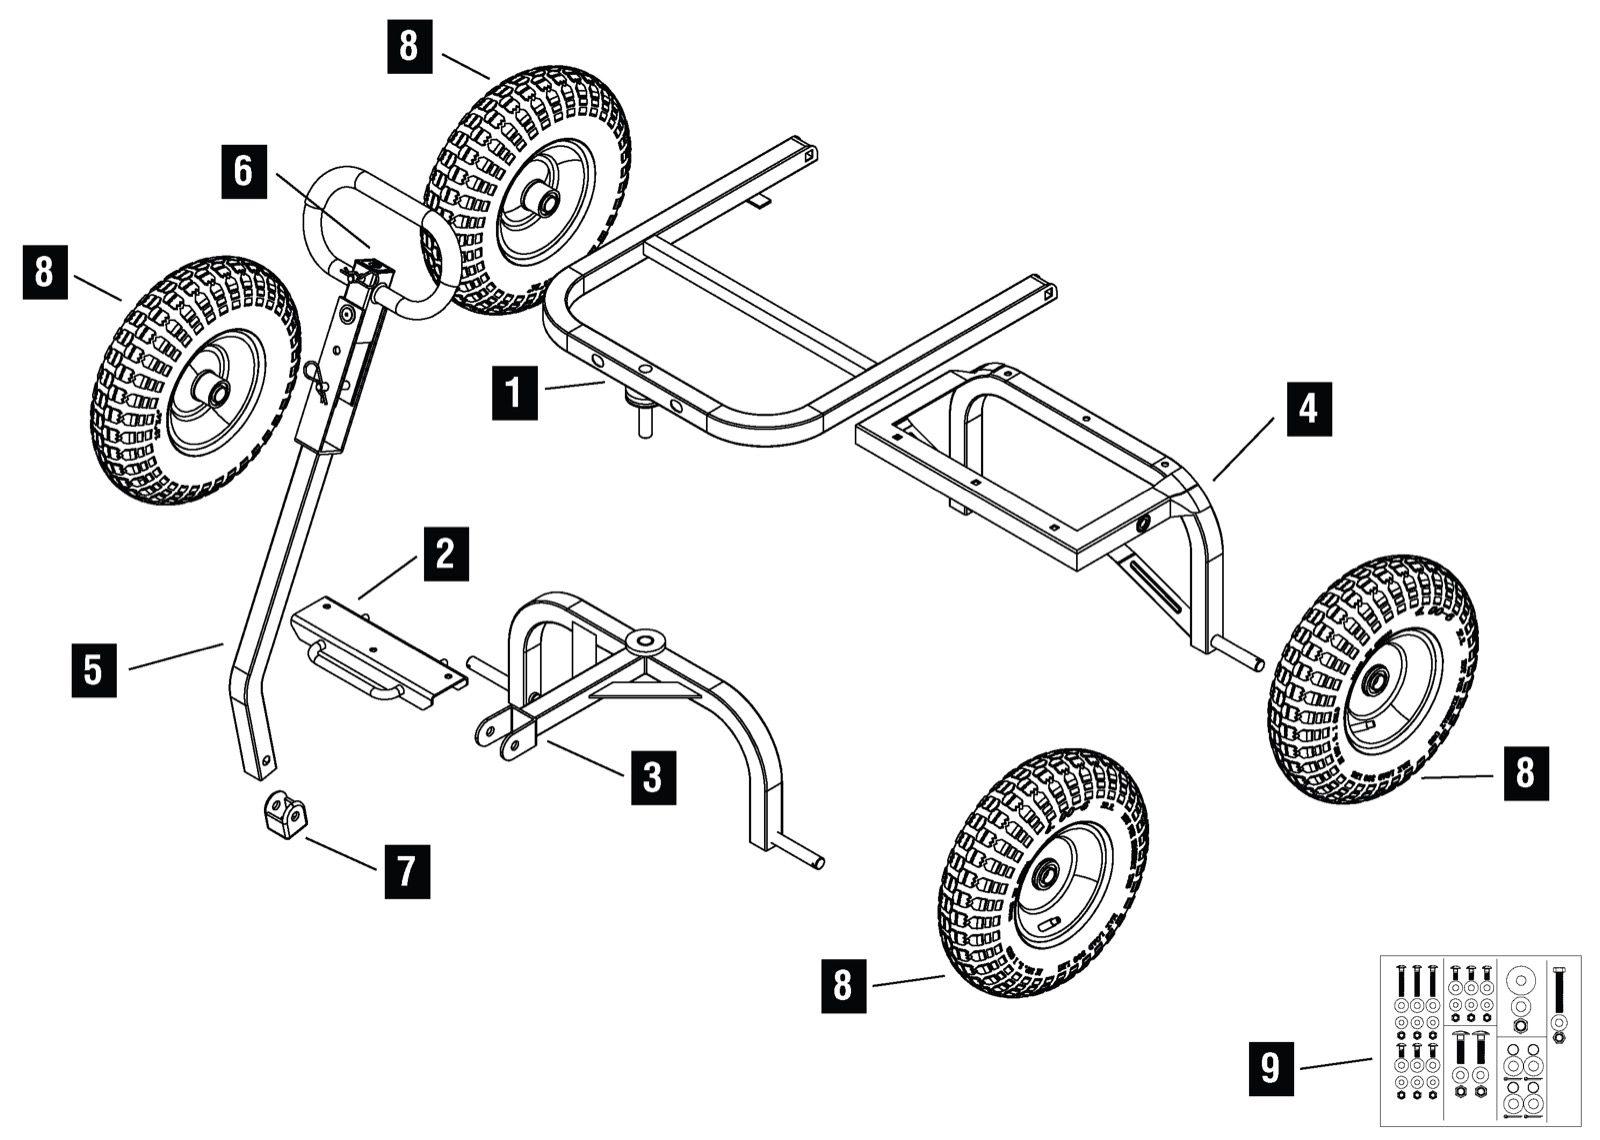 Taylor Golf Carts Wiring Source Vintage Cart 36 Volt Ezgo Diagram Gallery Moreover Likewise Harley Davidson Engine Also